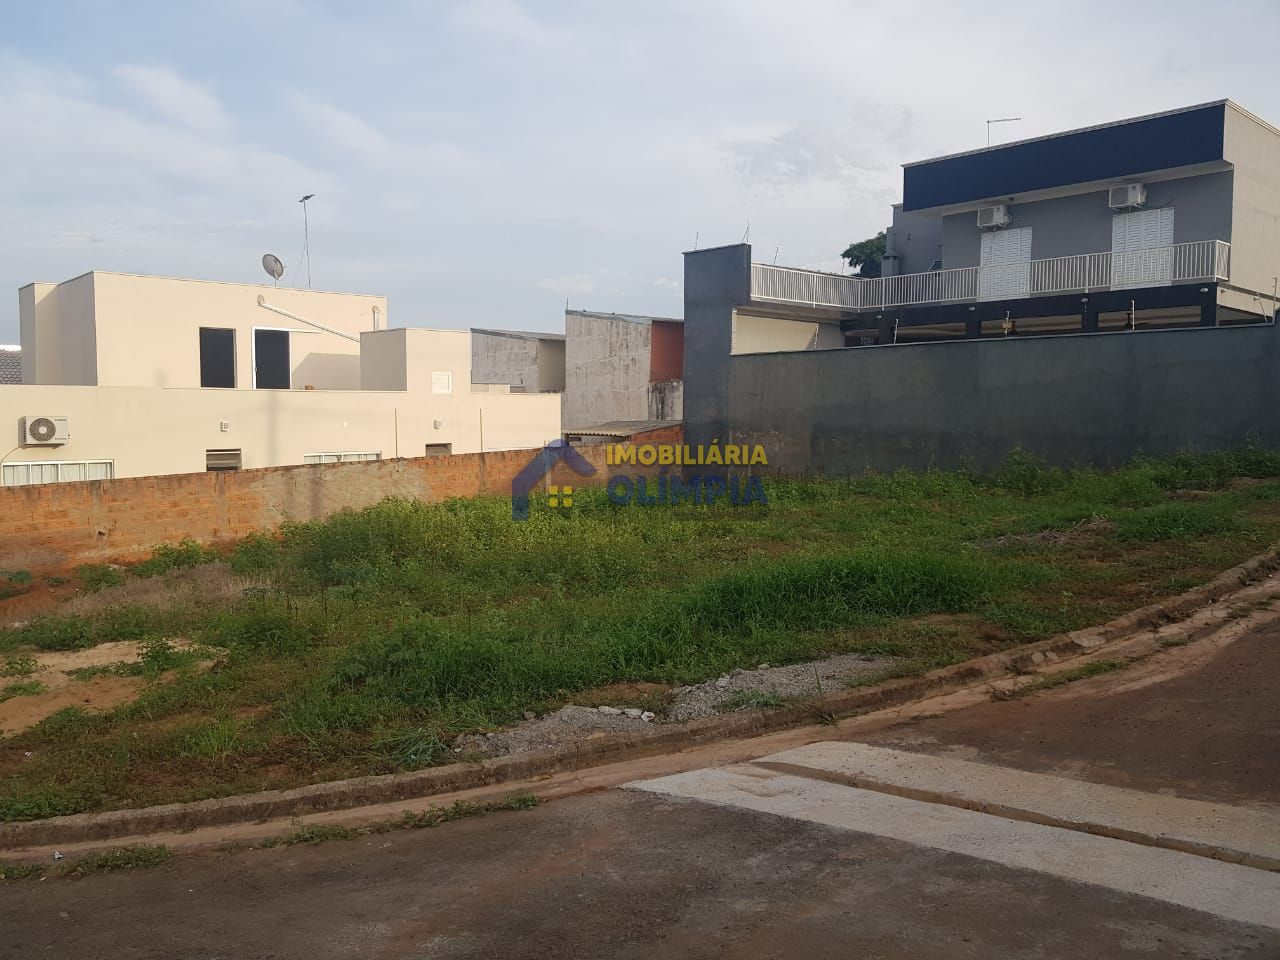 Terreno/Lote à venda  no Jardim Nova Santa Rita - OlÍmpia, SP. Imóveis